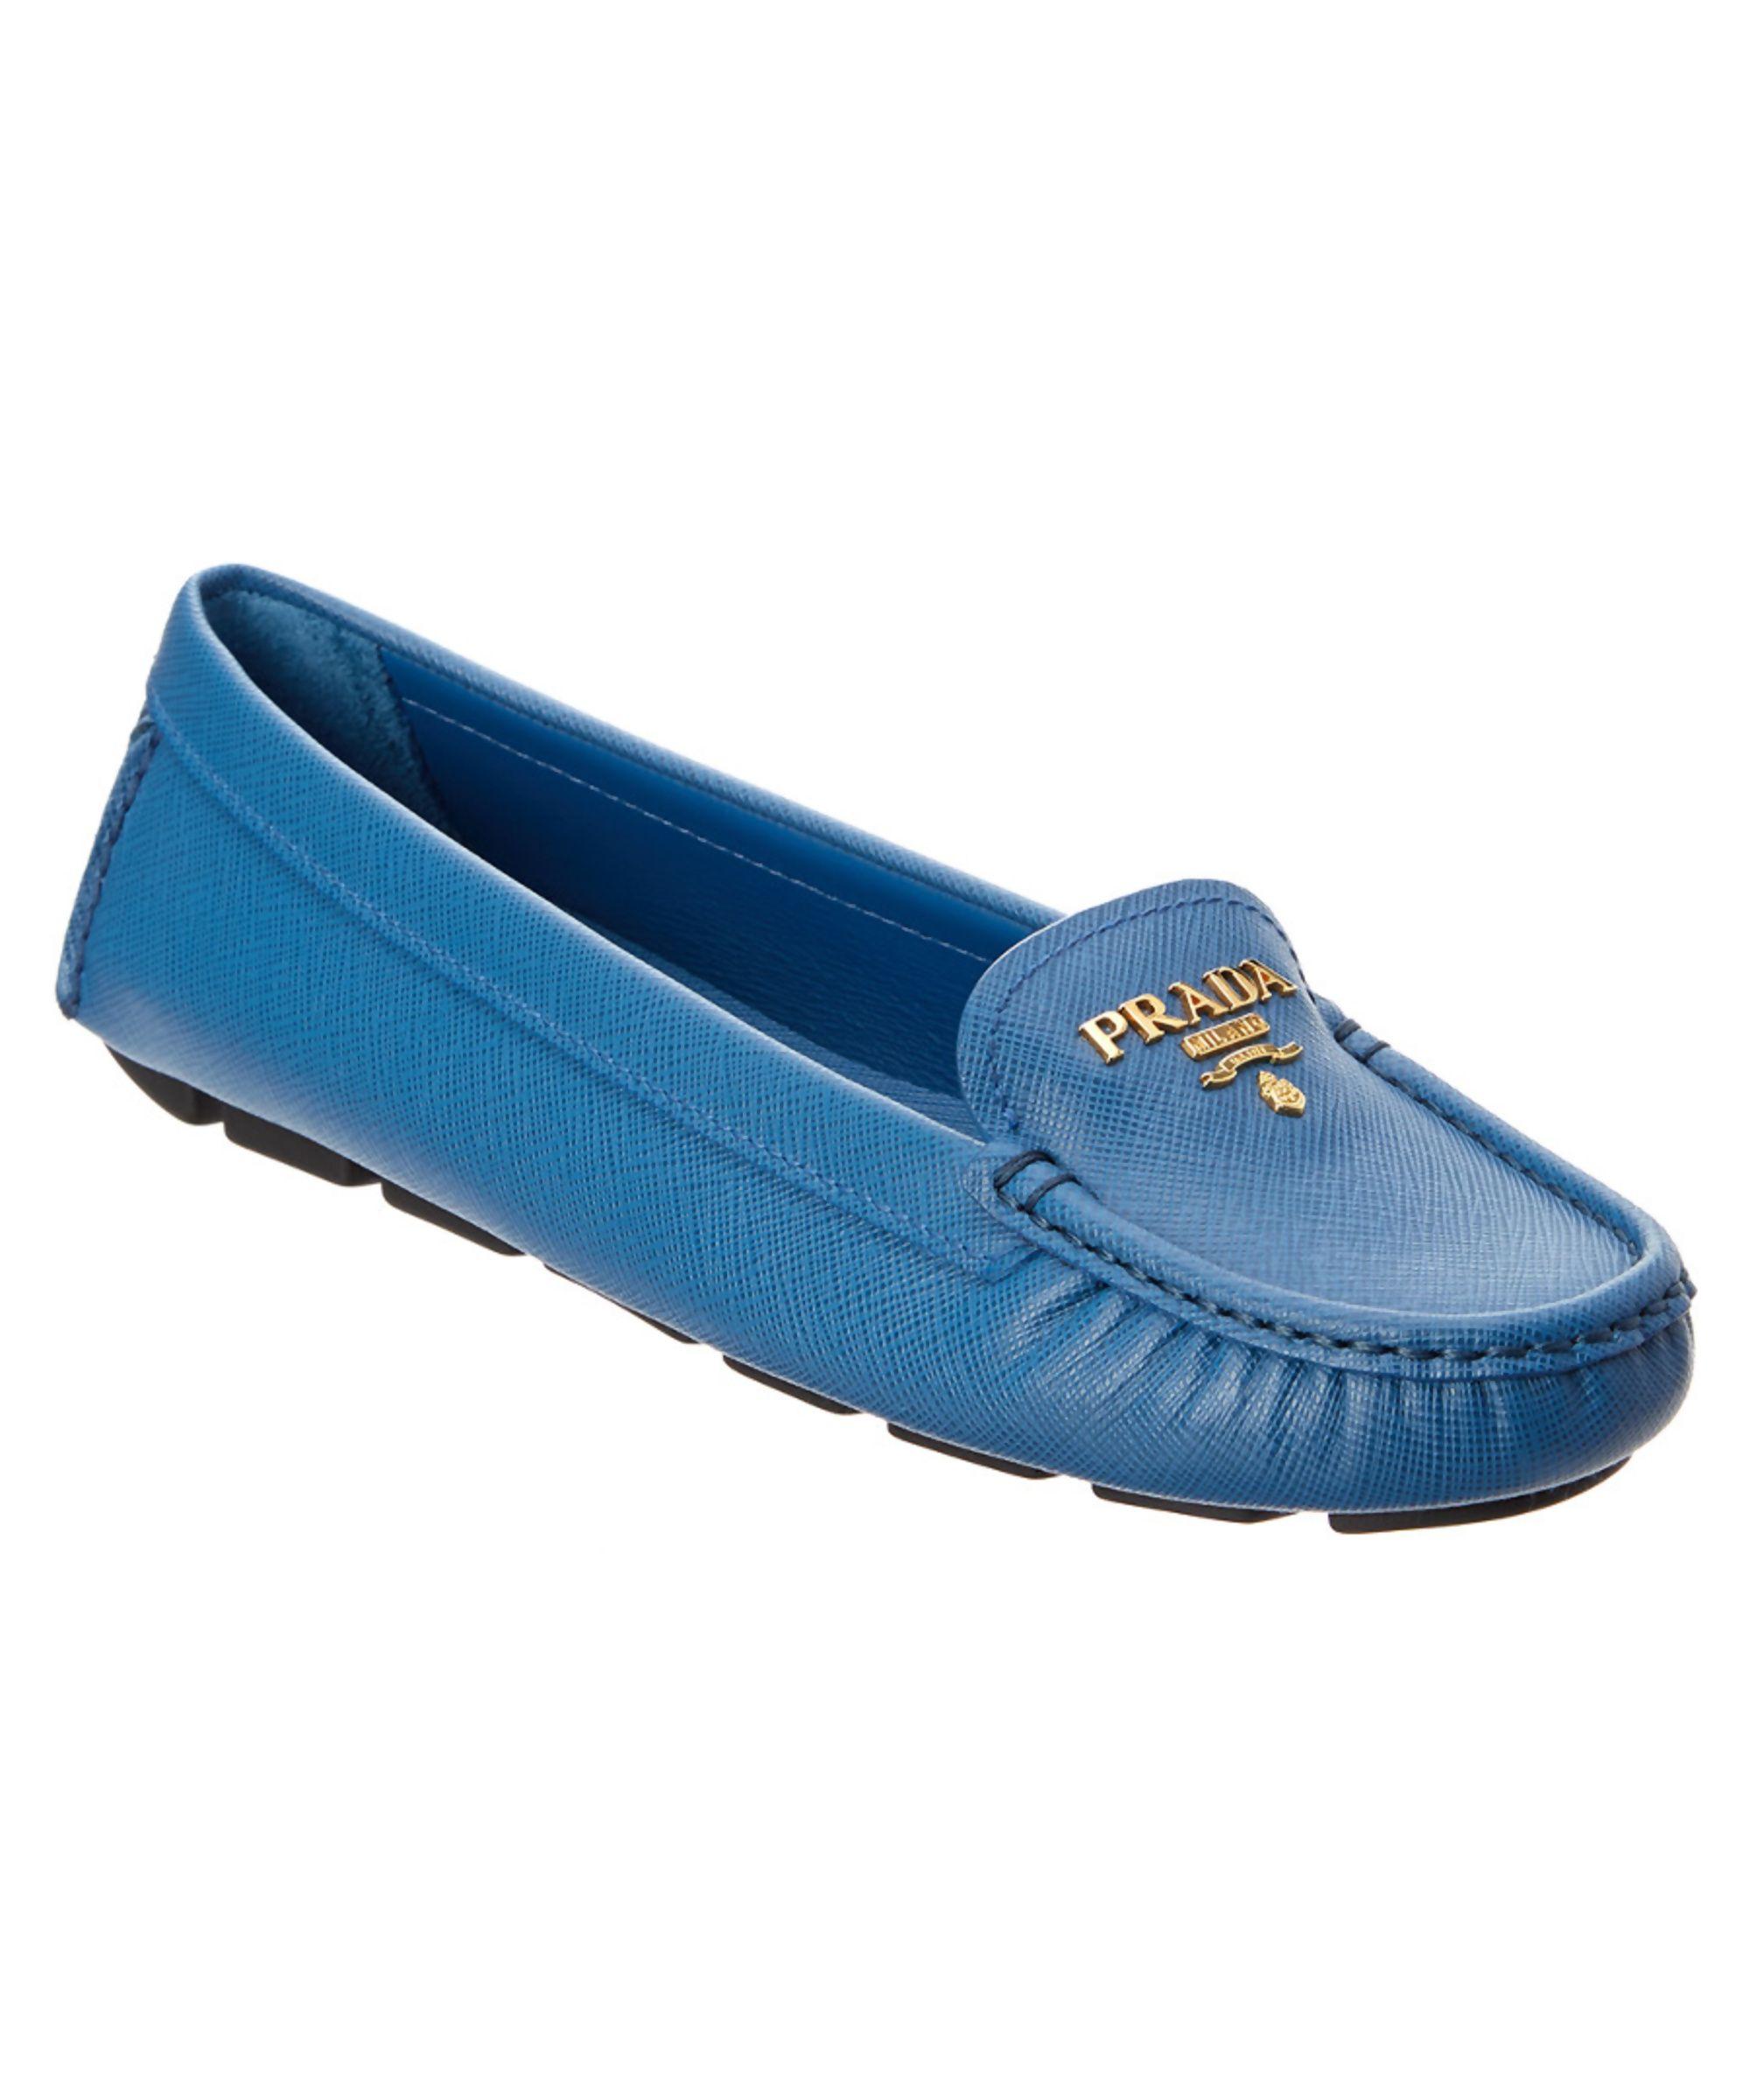 b1d29c7ff5c ... cheap prada prada saffiano leather moccasin shoes flats prada fc5d6  637ba